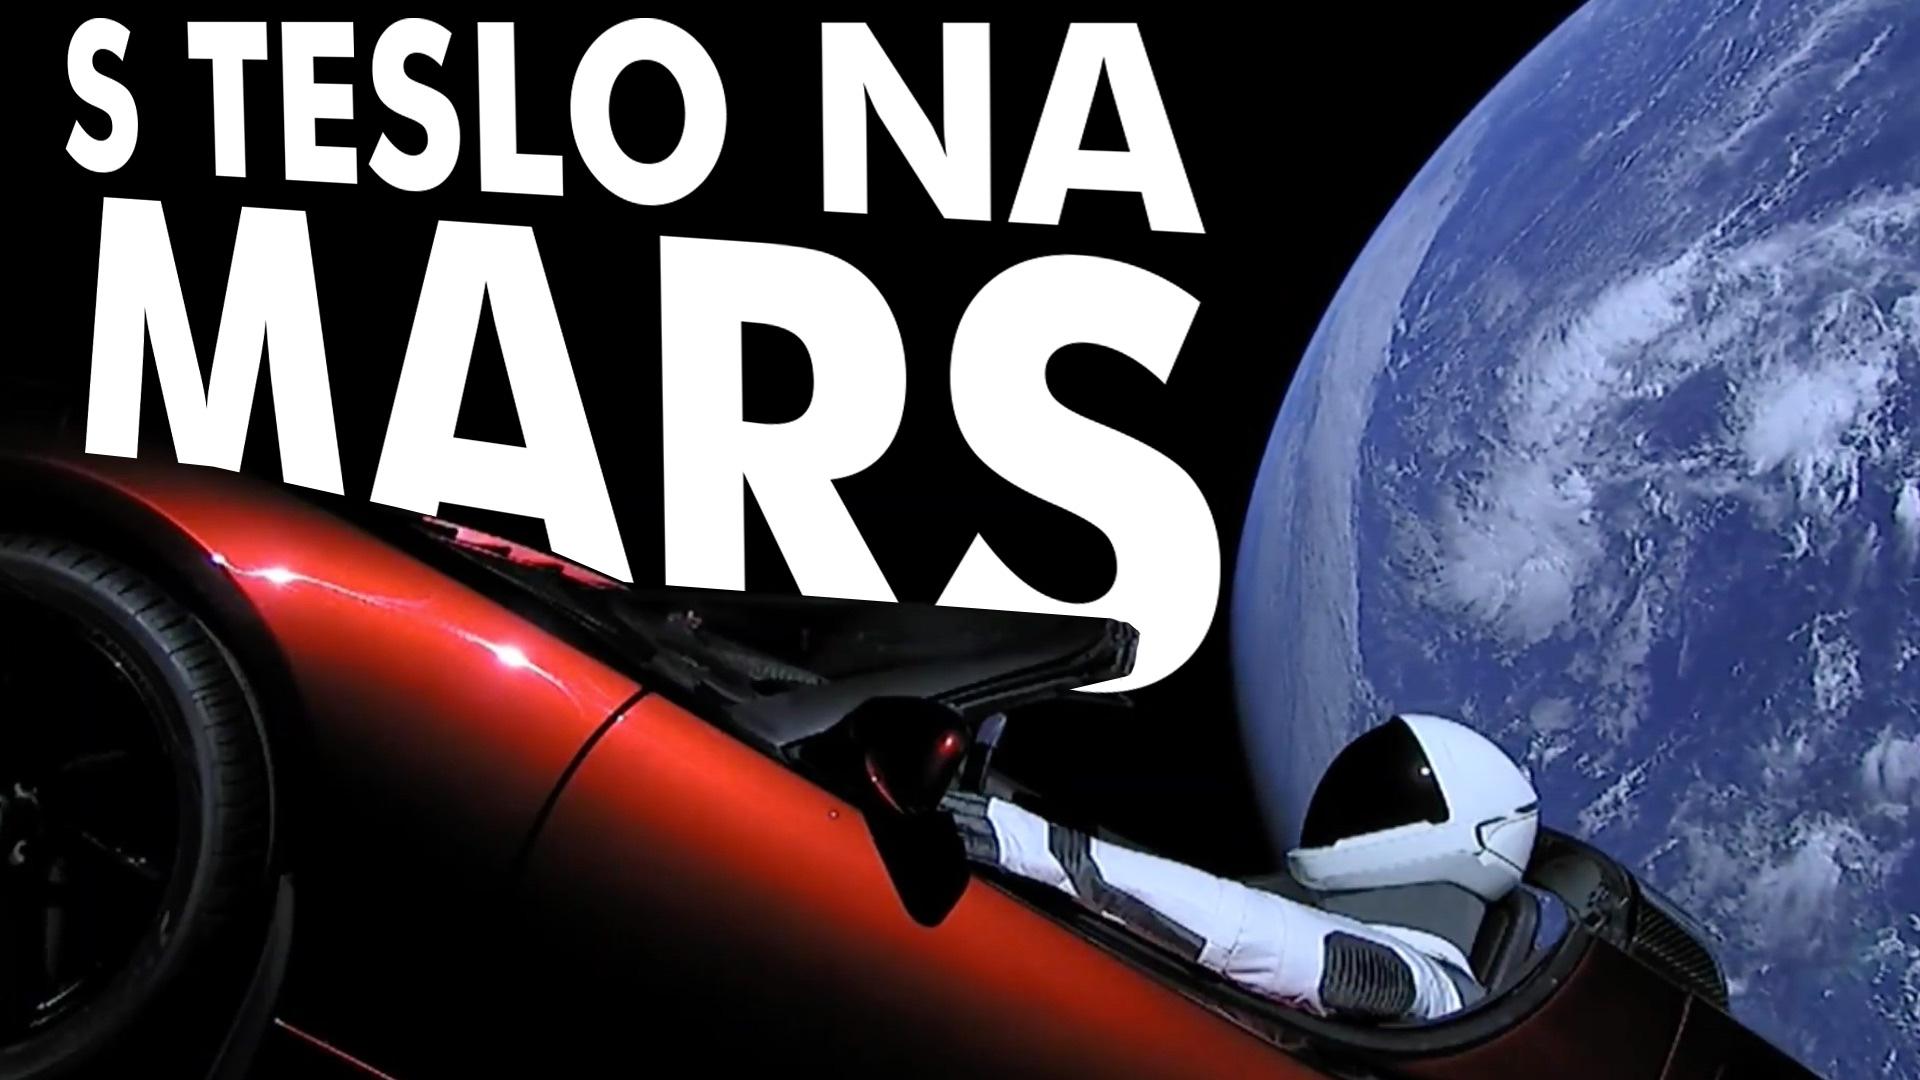 Tesla, SpaceX, Falcon Heavy